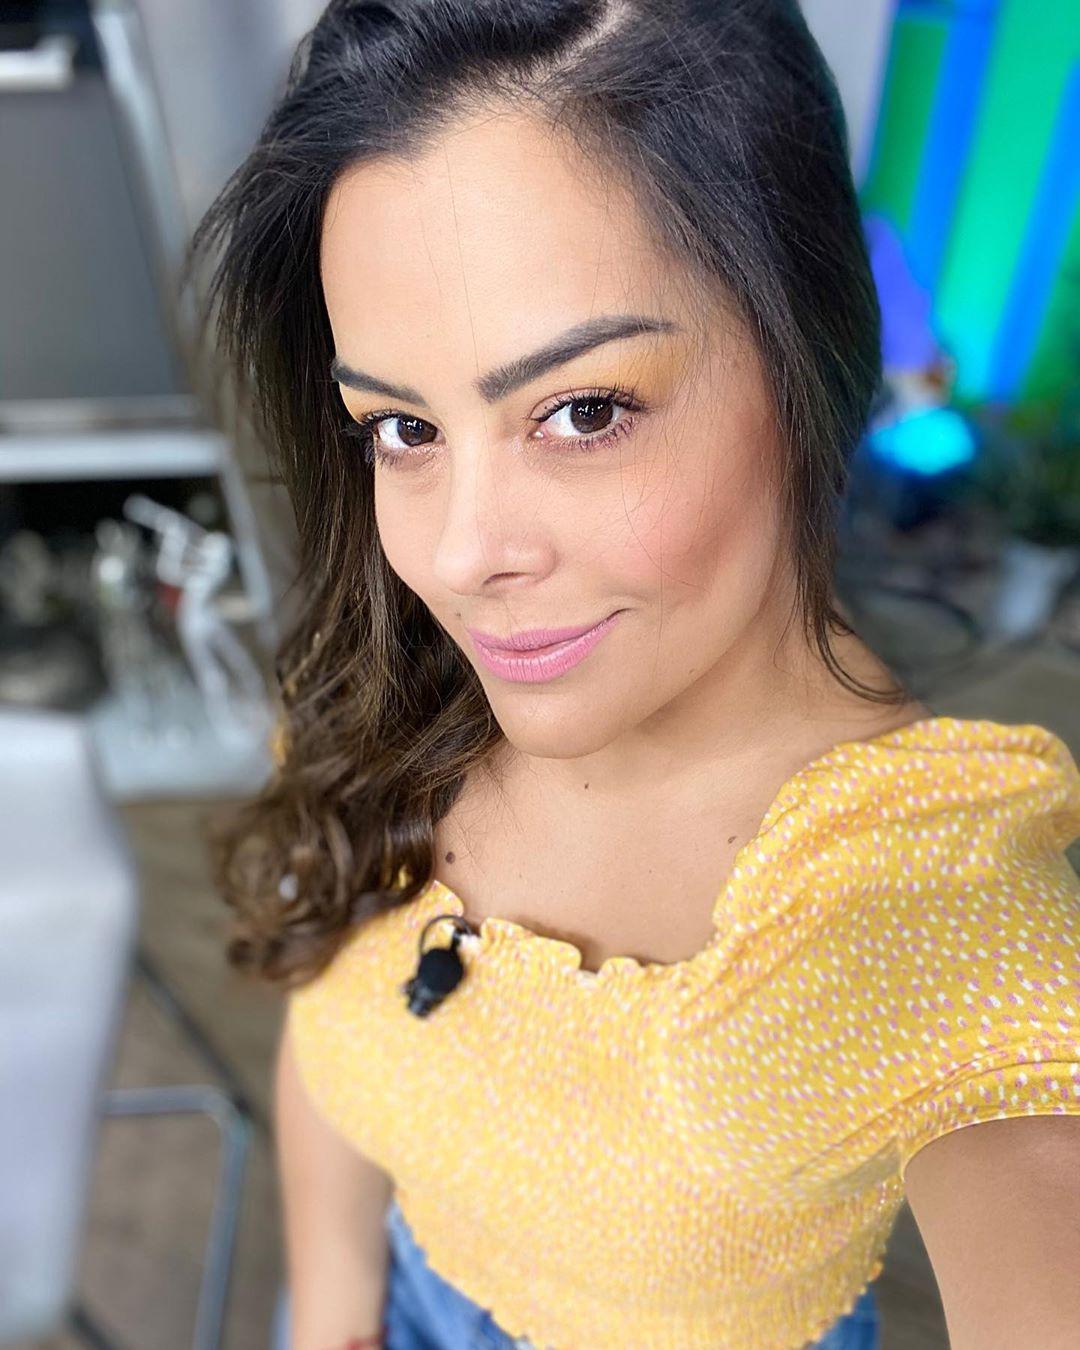 Lari Riquelme Beautiful Black Hairs, Lip Makeup, Long Hair Instagram